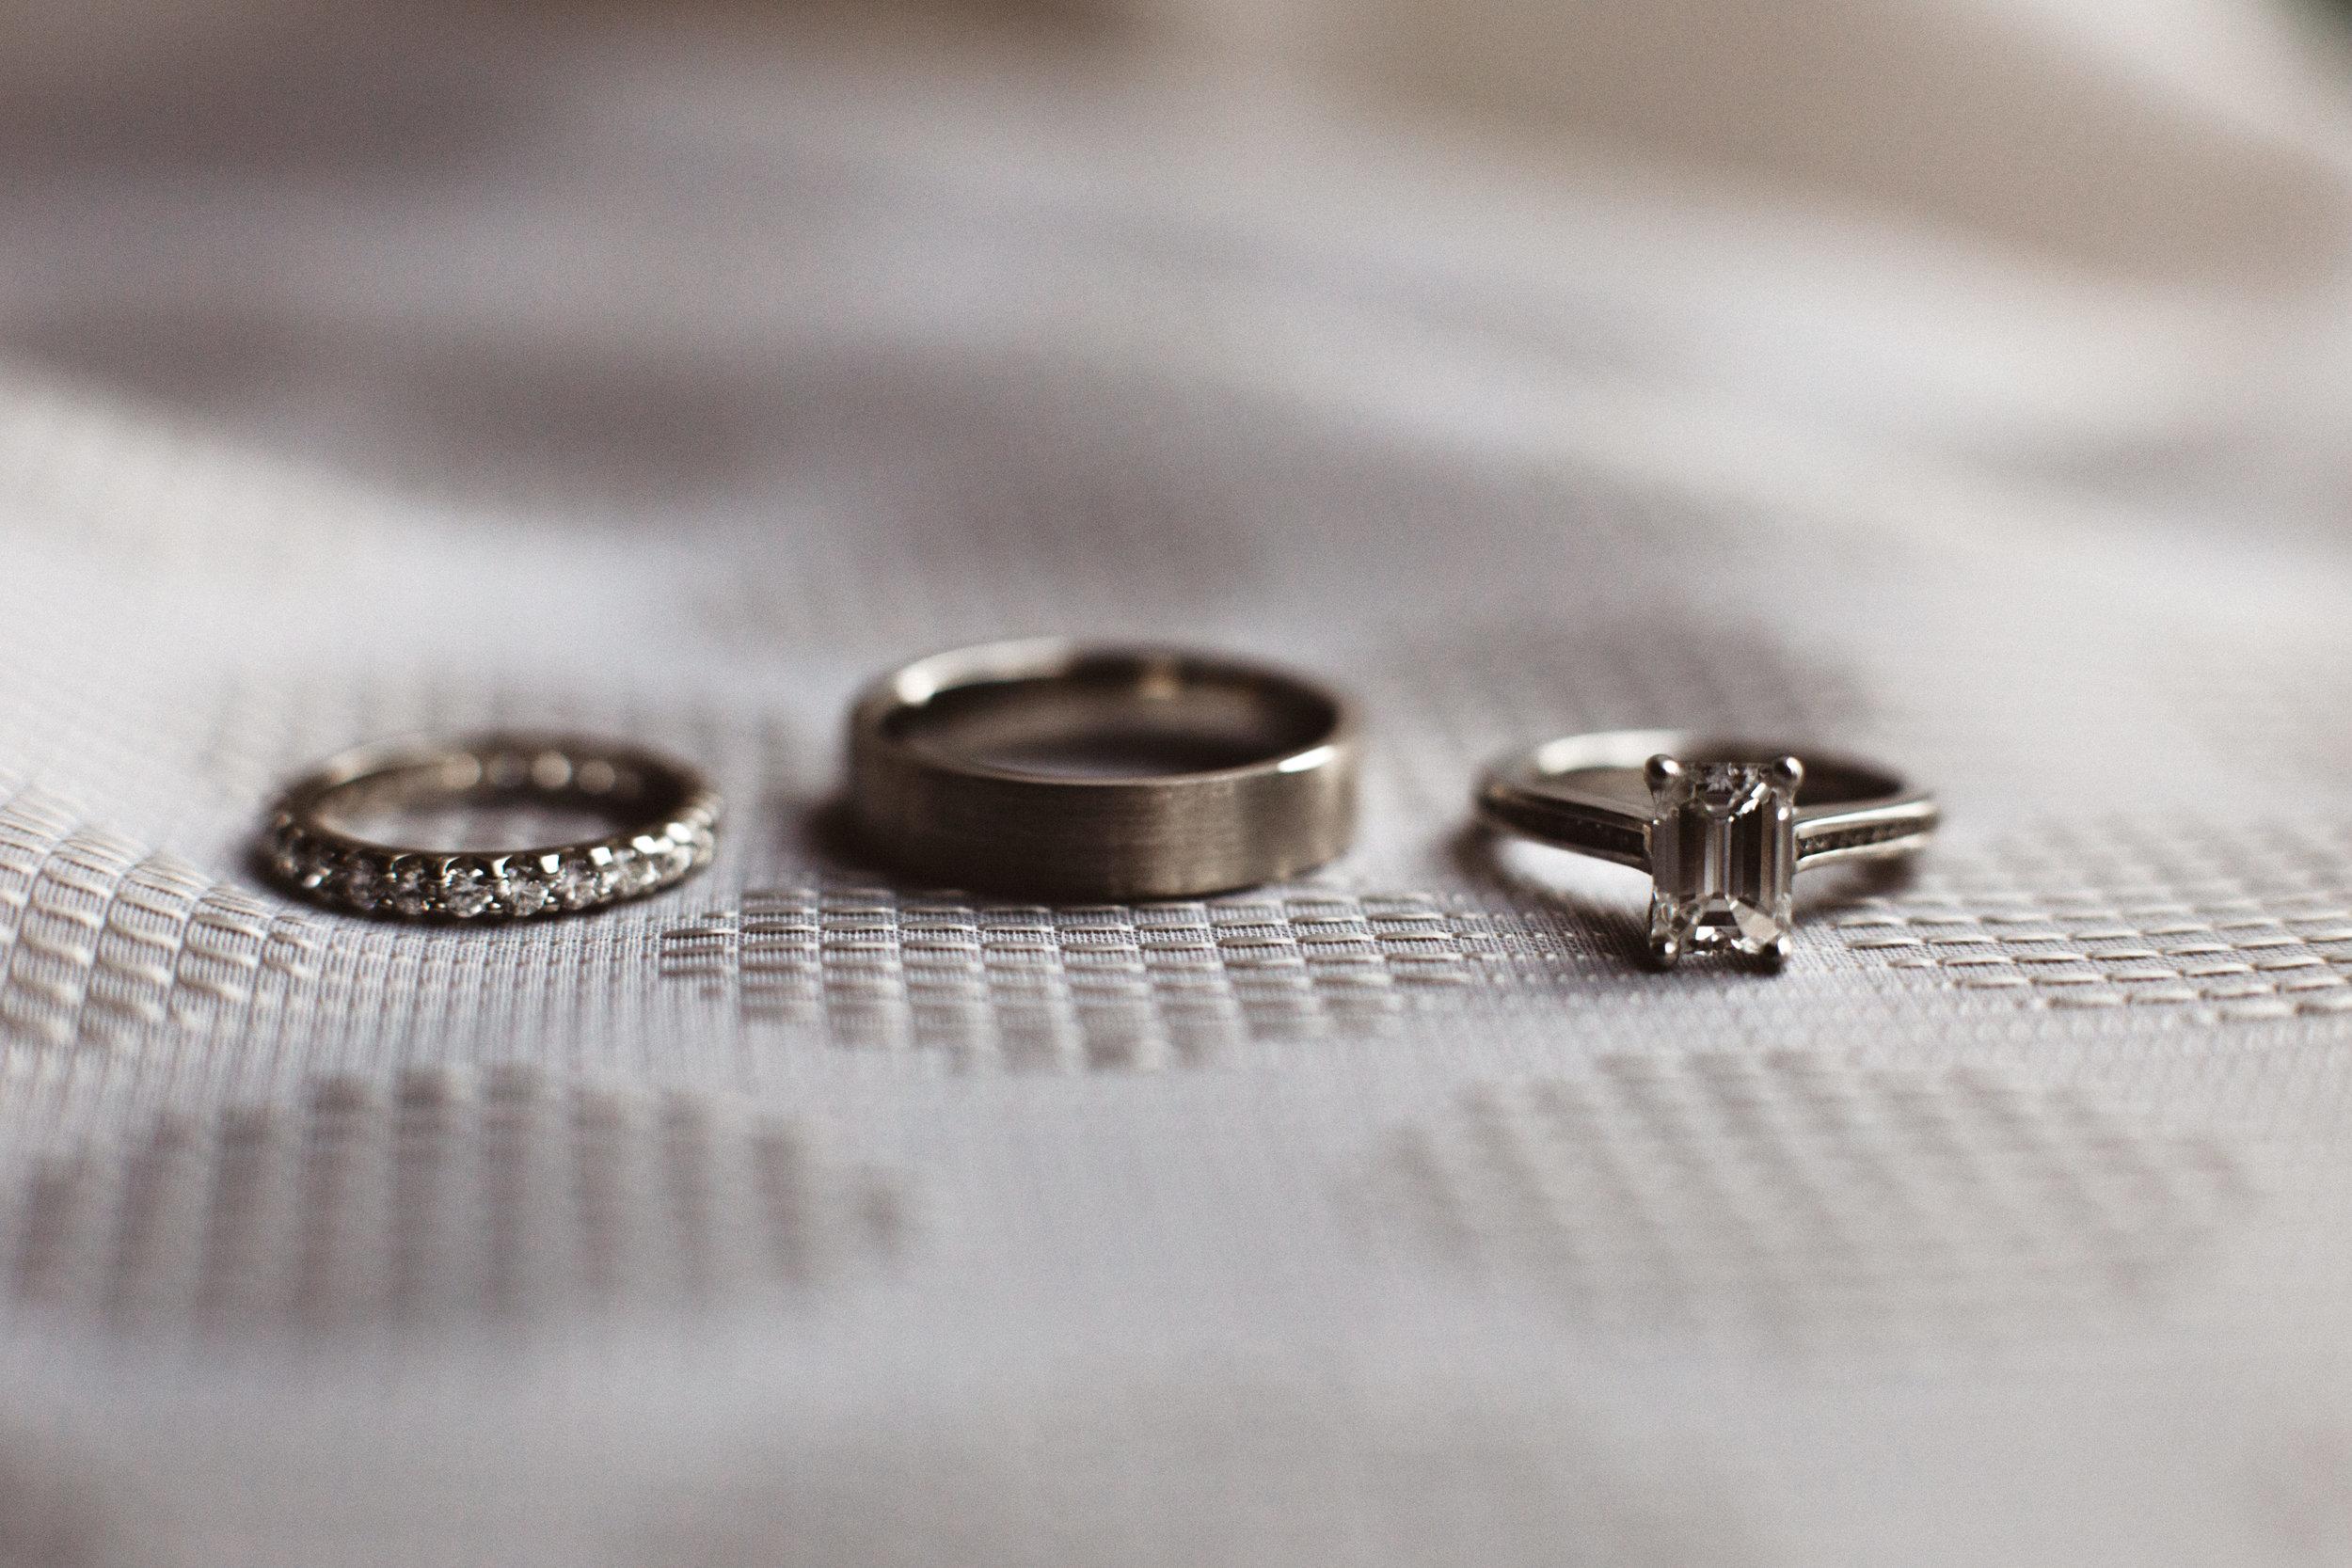 Mattie Bell Photography- Kelly & Zack Wedding Atlanta Brewery -25.jpg